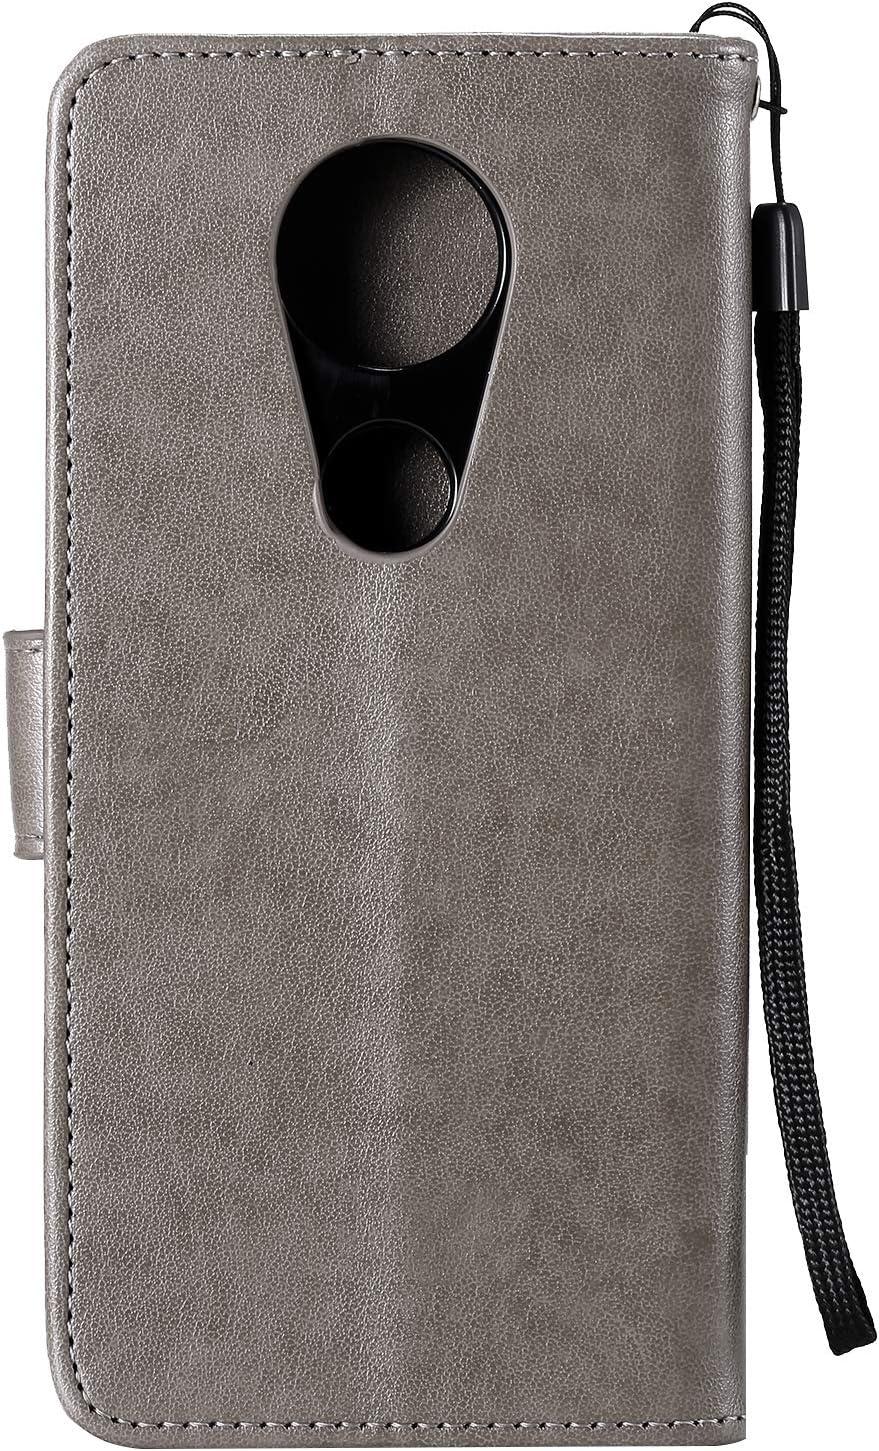 Lomogo Embossed Owl Moto E5 Plus Case Leather Wallet Case with Kickstand Card Holder Shockproof Flip Case Cover for Motorola Moto E Plus 5th Gen LOHHA100705 Rose Gold